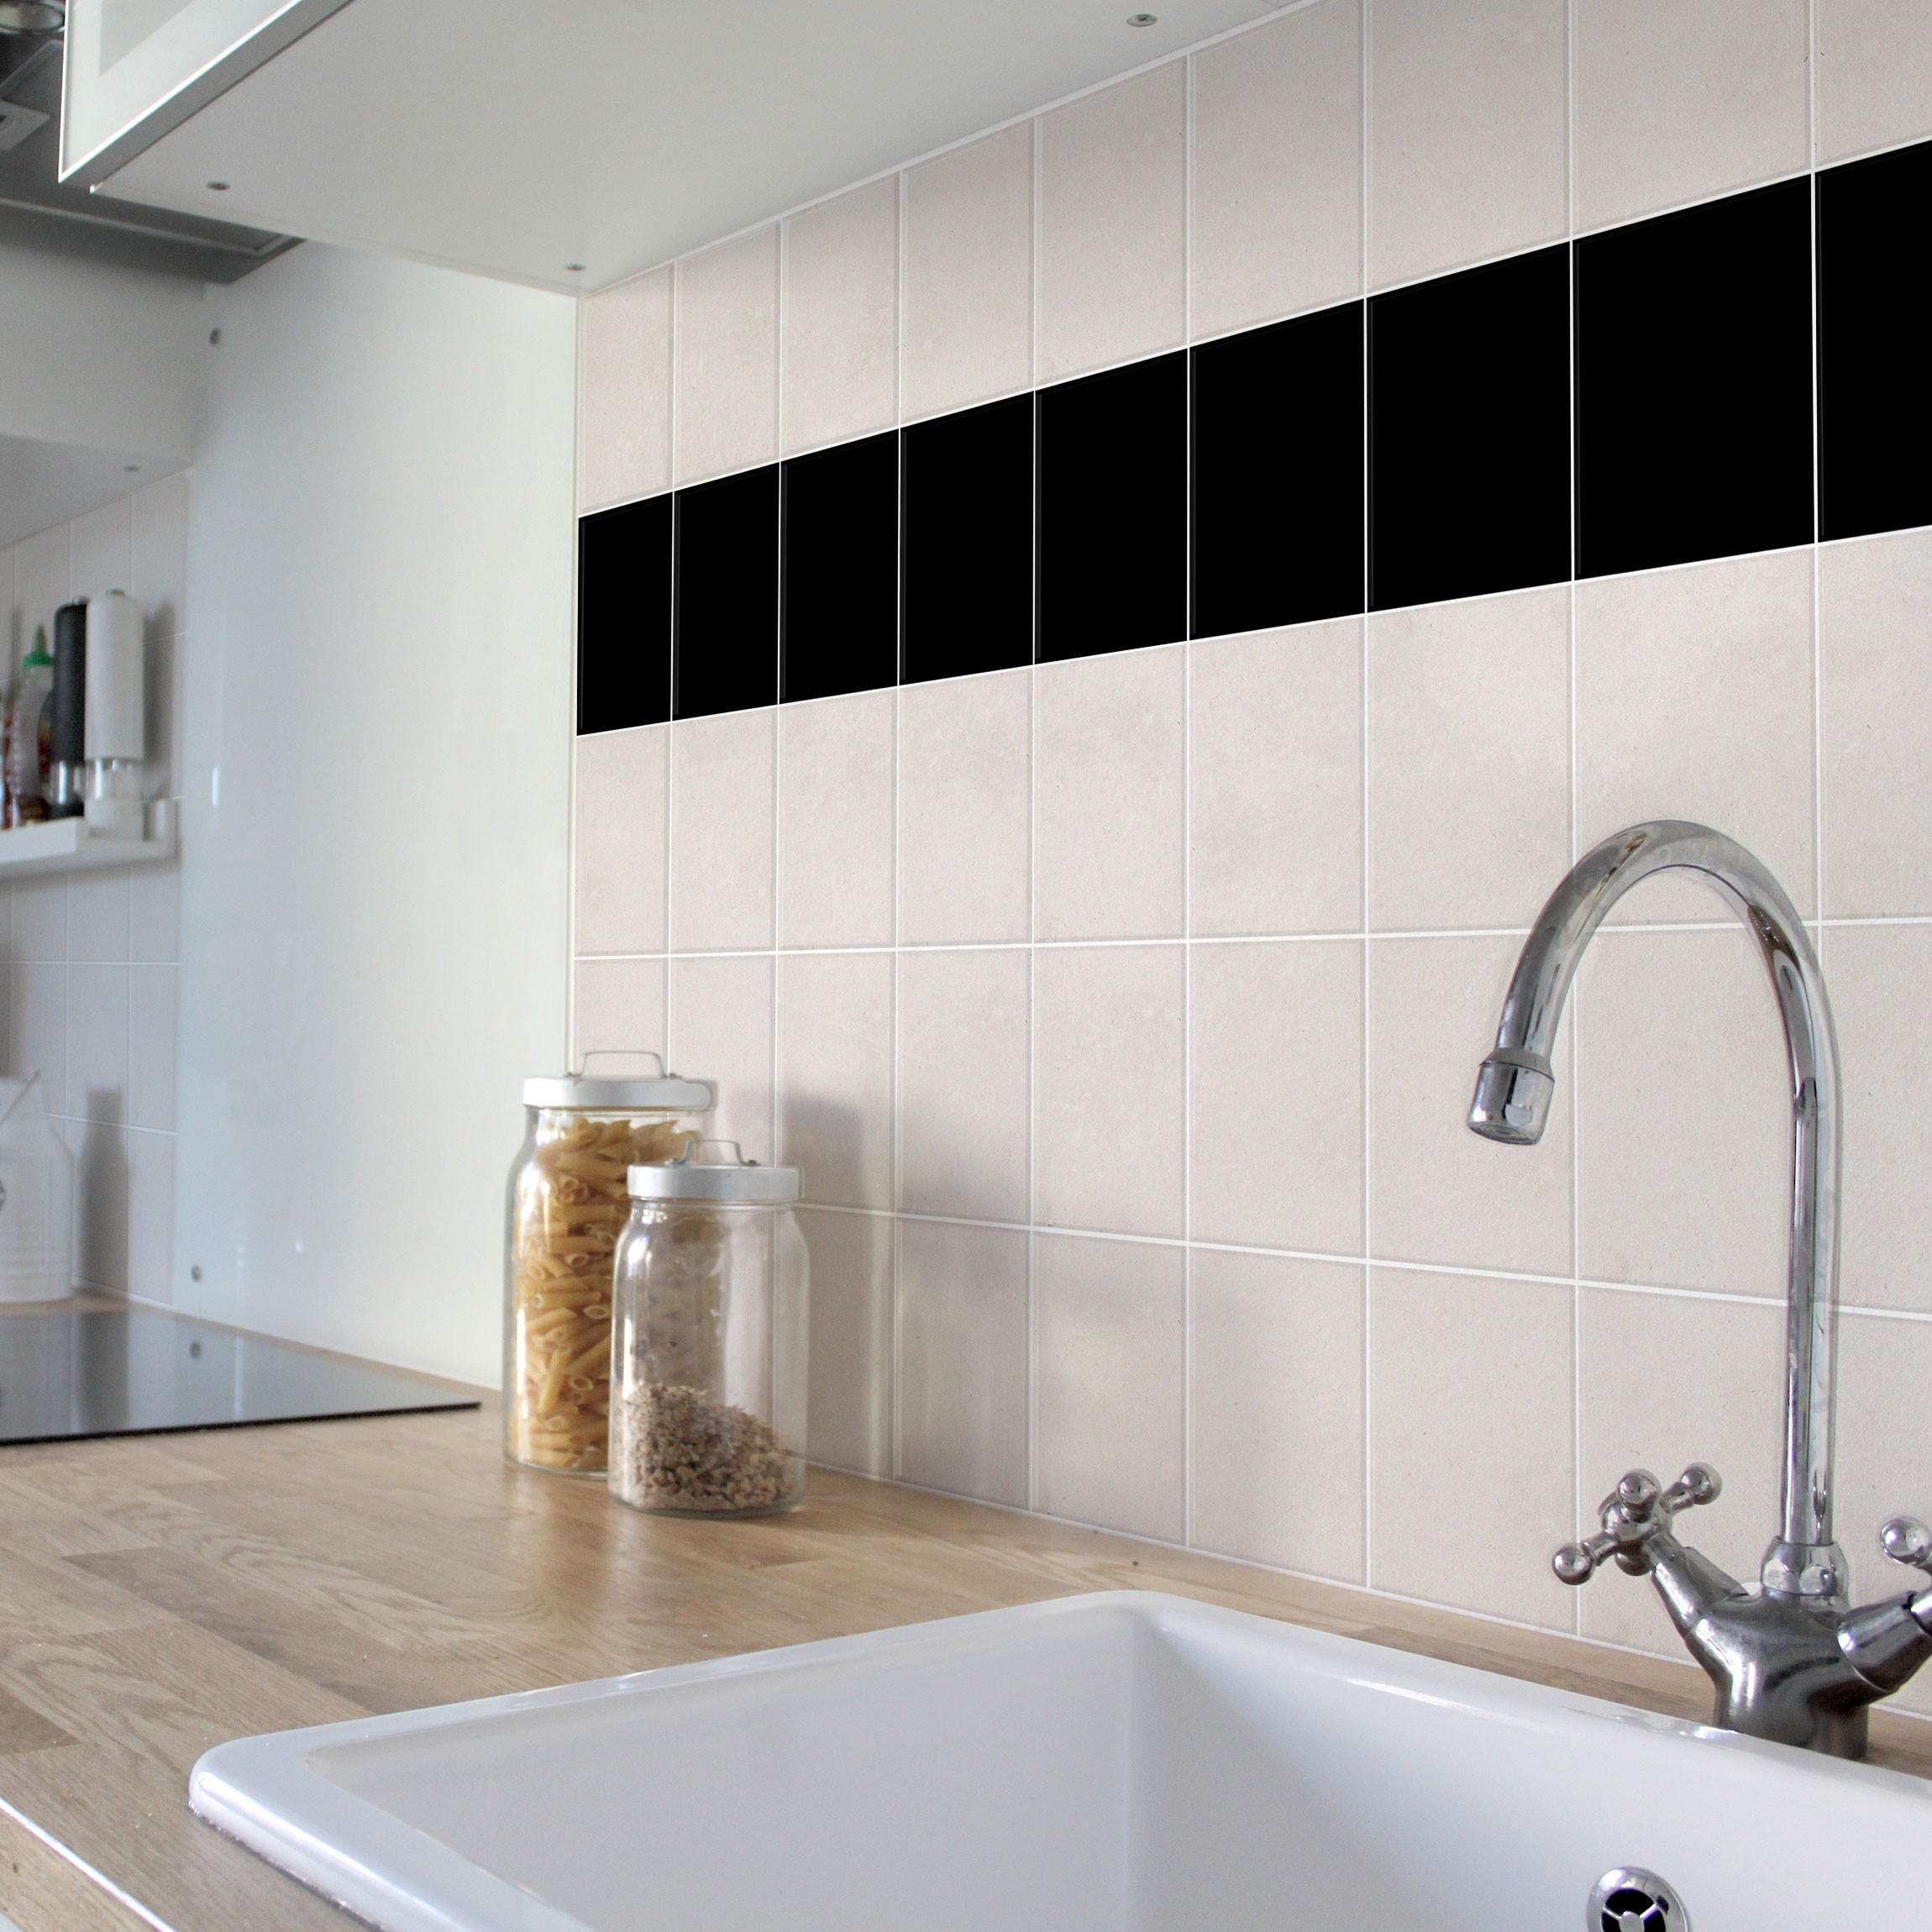 fliesenaufkleber bad k che schwarz 10x10 cm set. Black Bedroom Furniture Sets. Home Design Ideas